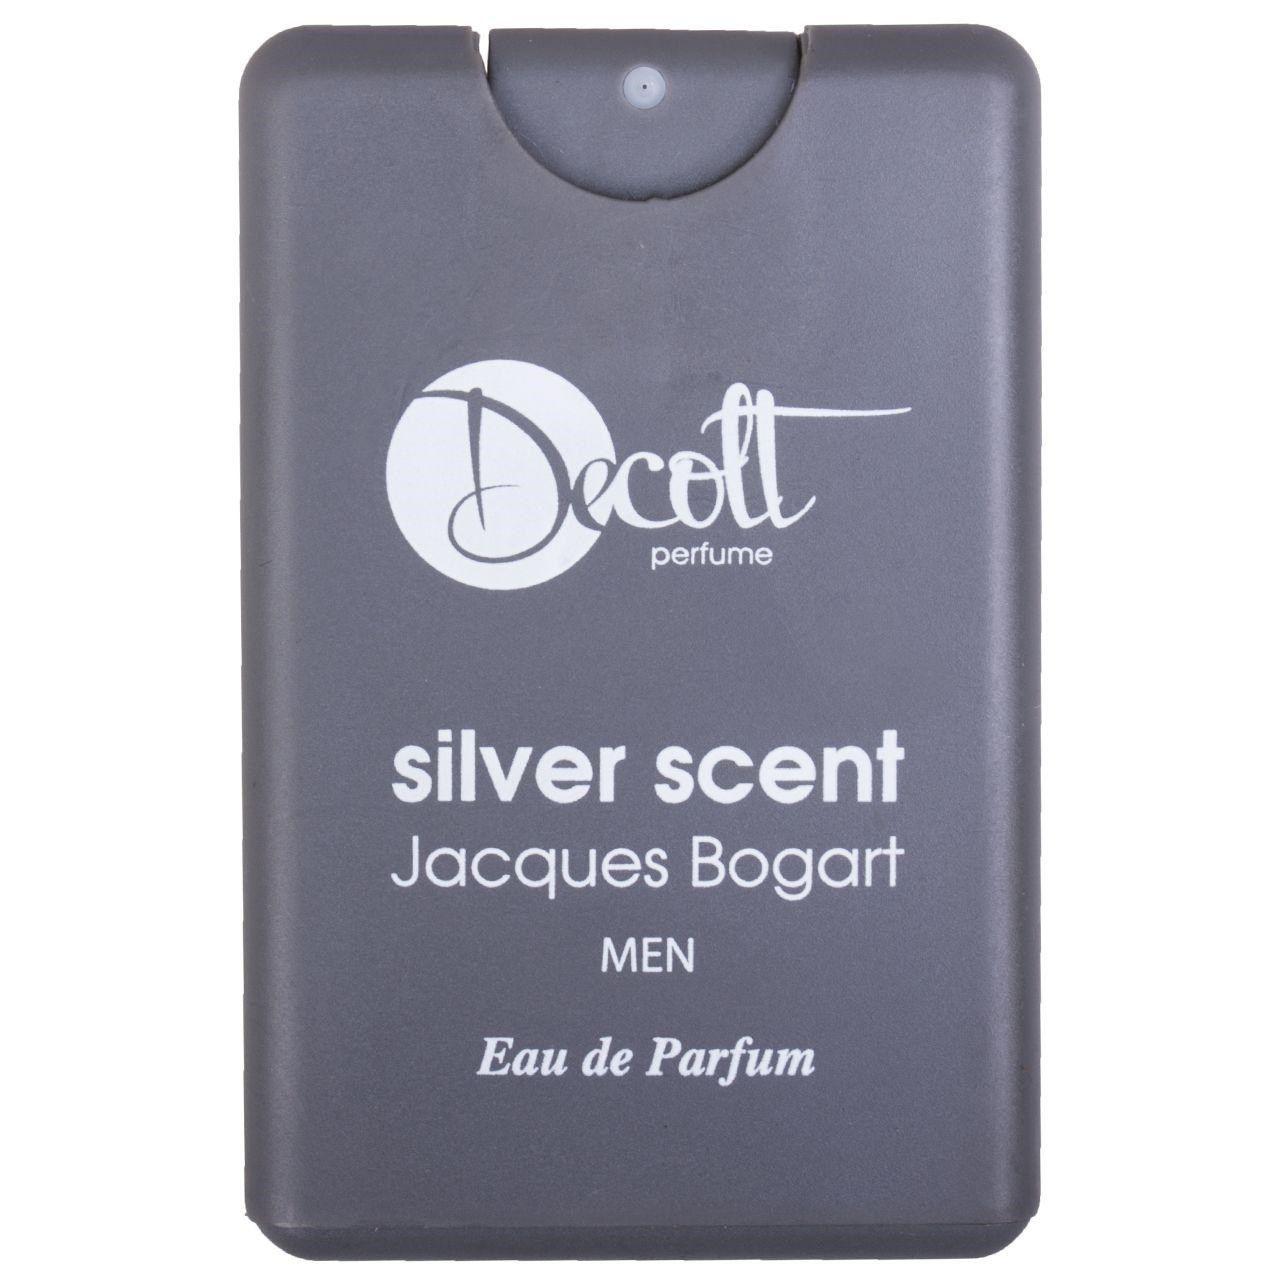 عطر جیبی مردانه دکلت رایحه Silver Scent Jacques Bogart حجم 20 میلی لیتر -  - 1